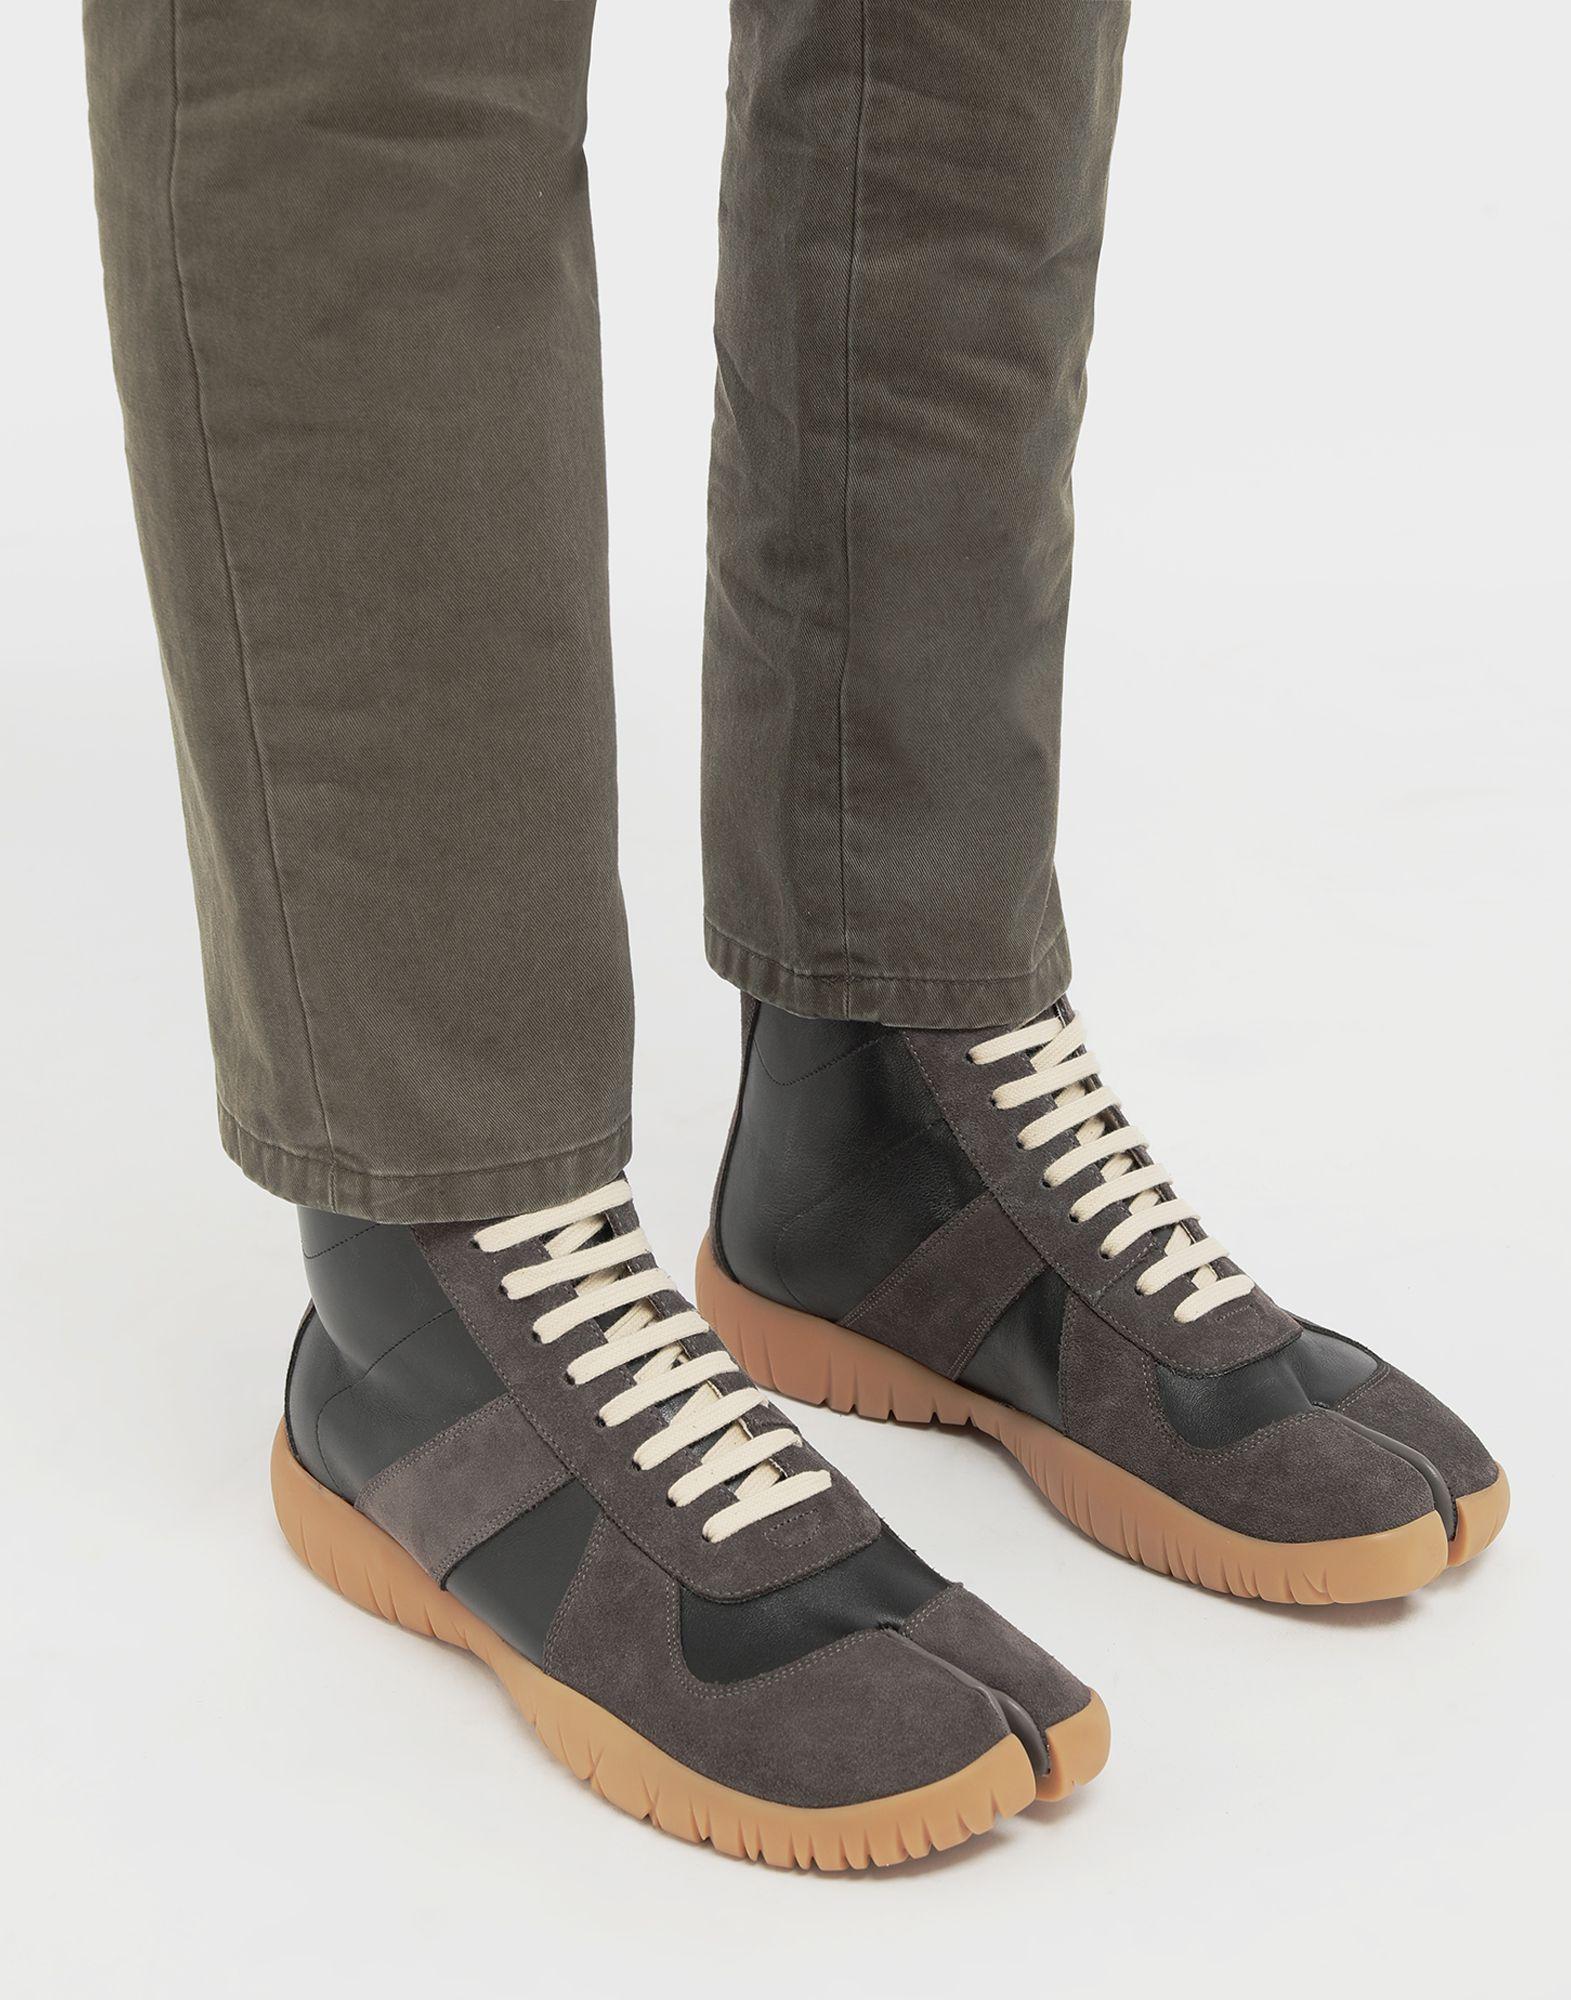 MAISON MARGIELA High-top Replica Tabi sneakers Sneakers Tabi Man b